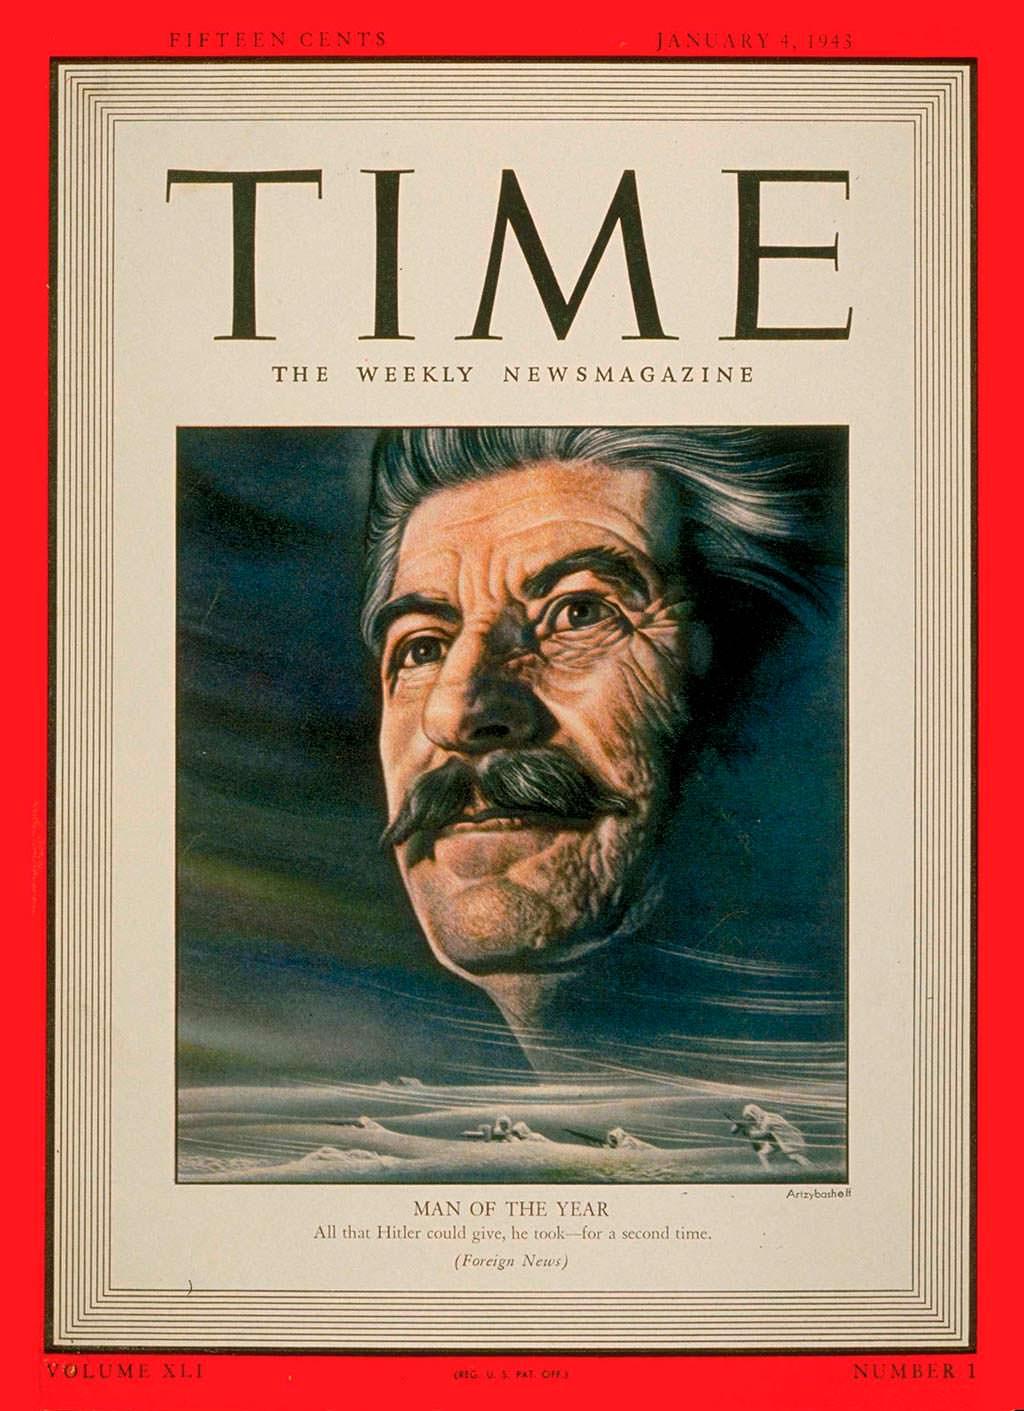 1942 год. Иосиф Виссарионович Сталин на обложке Time